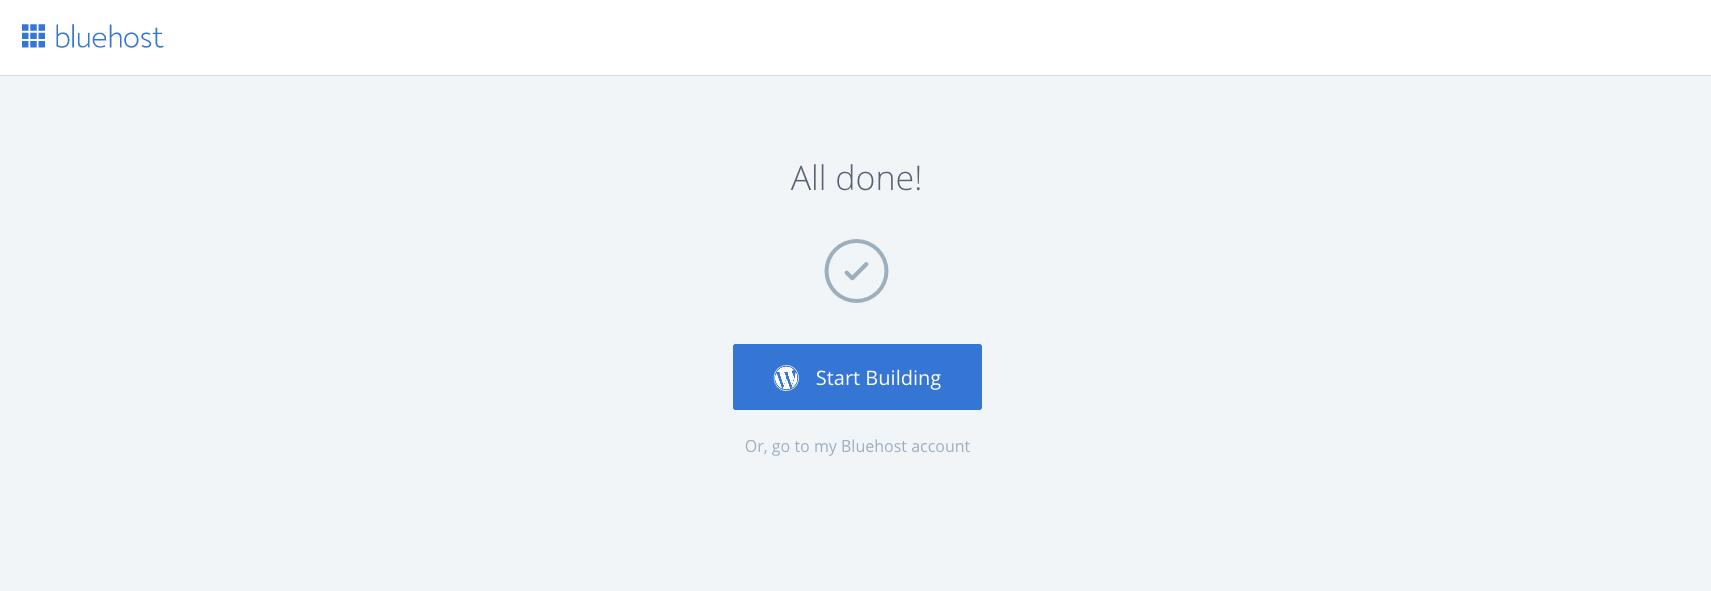 Bluehost Step 10 (11-6-17)